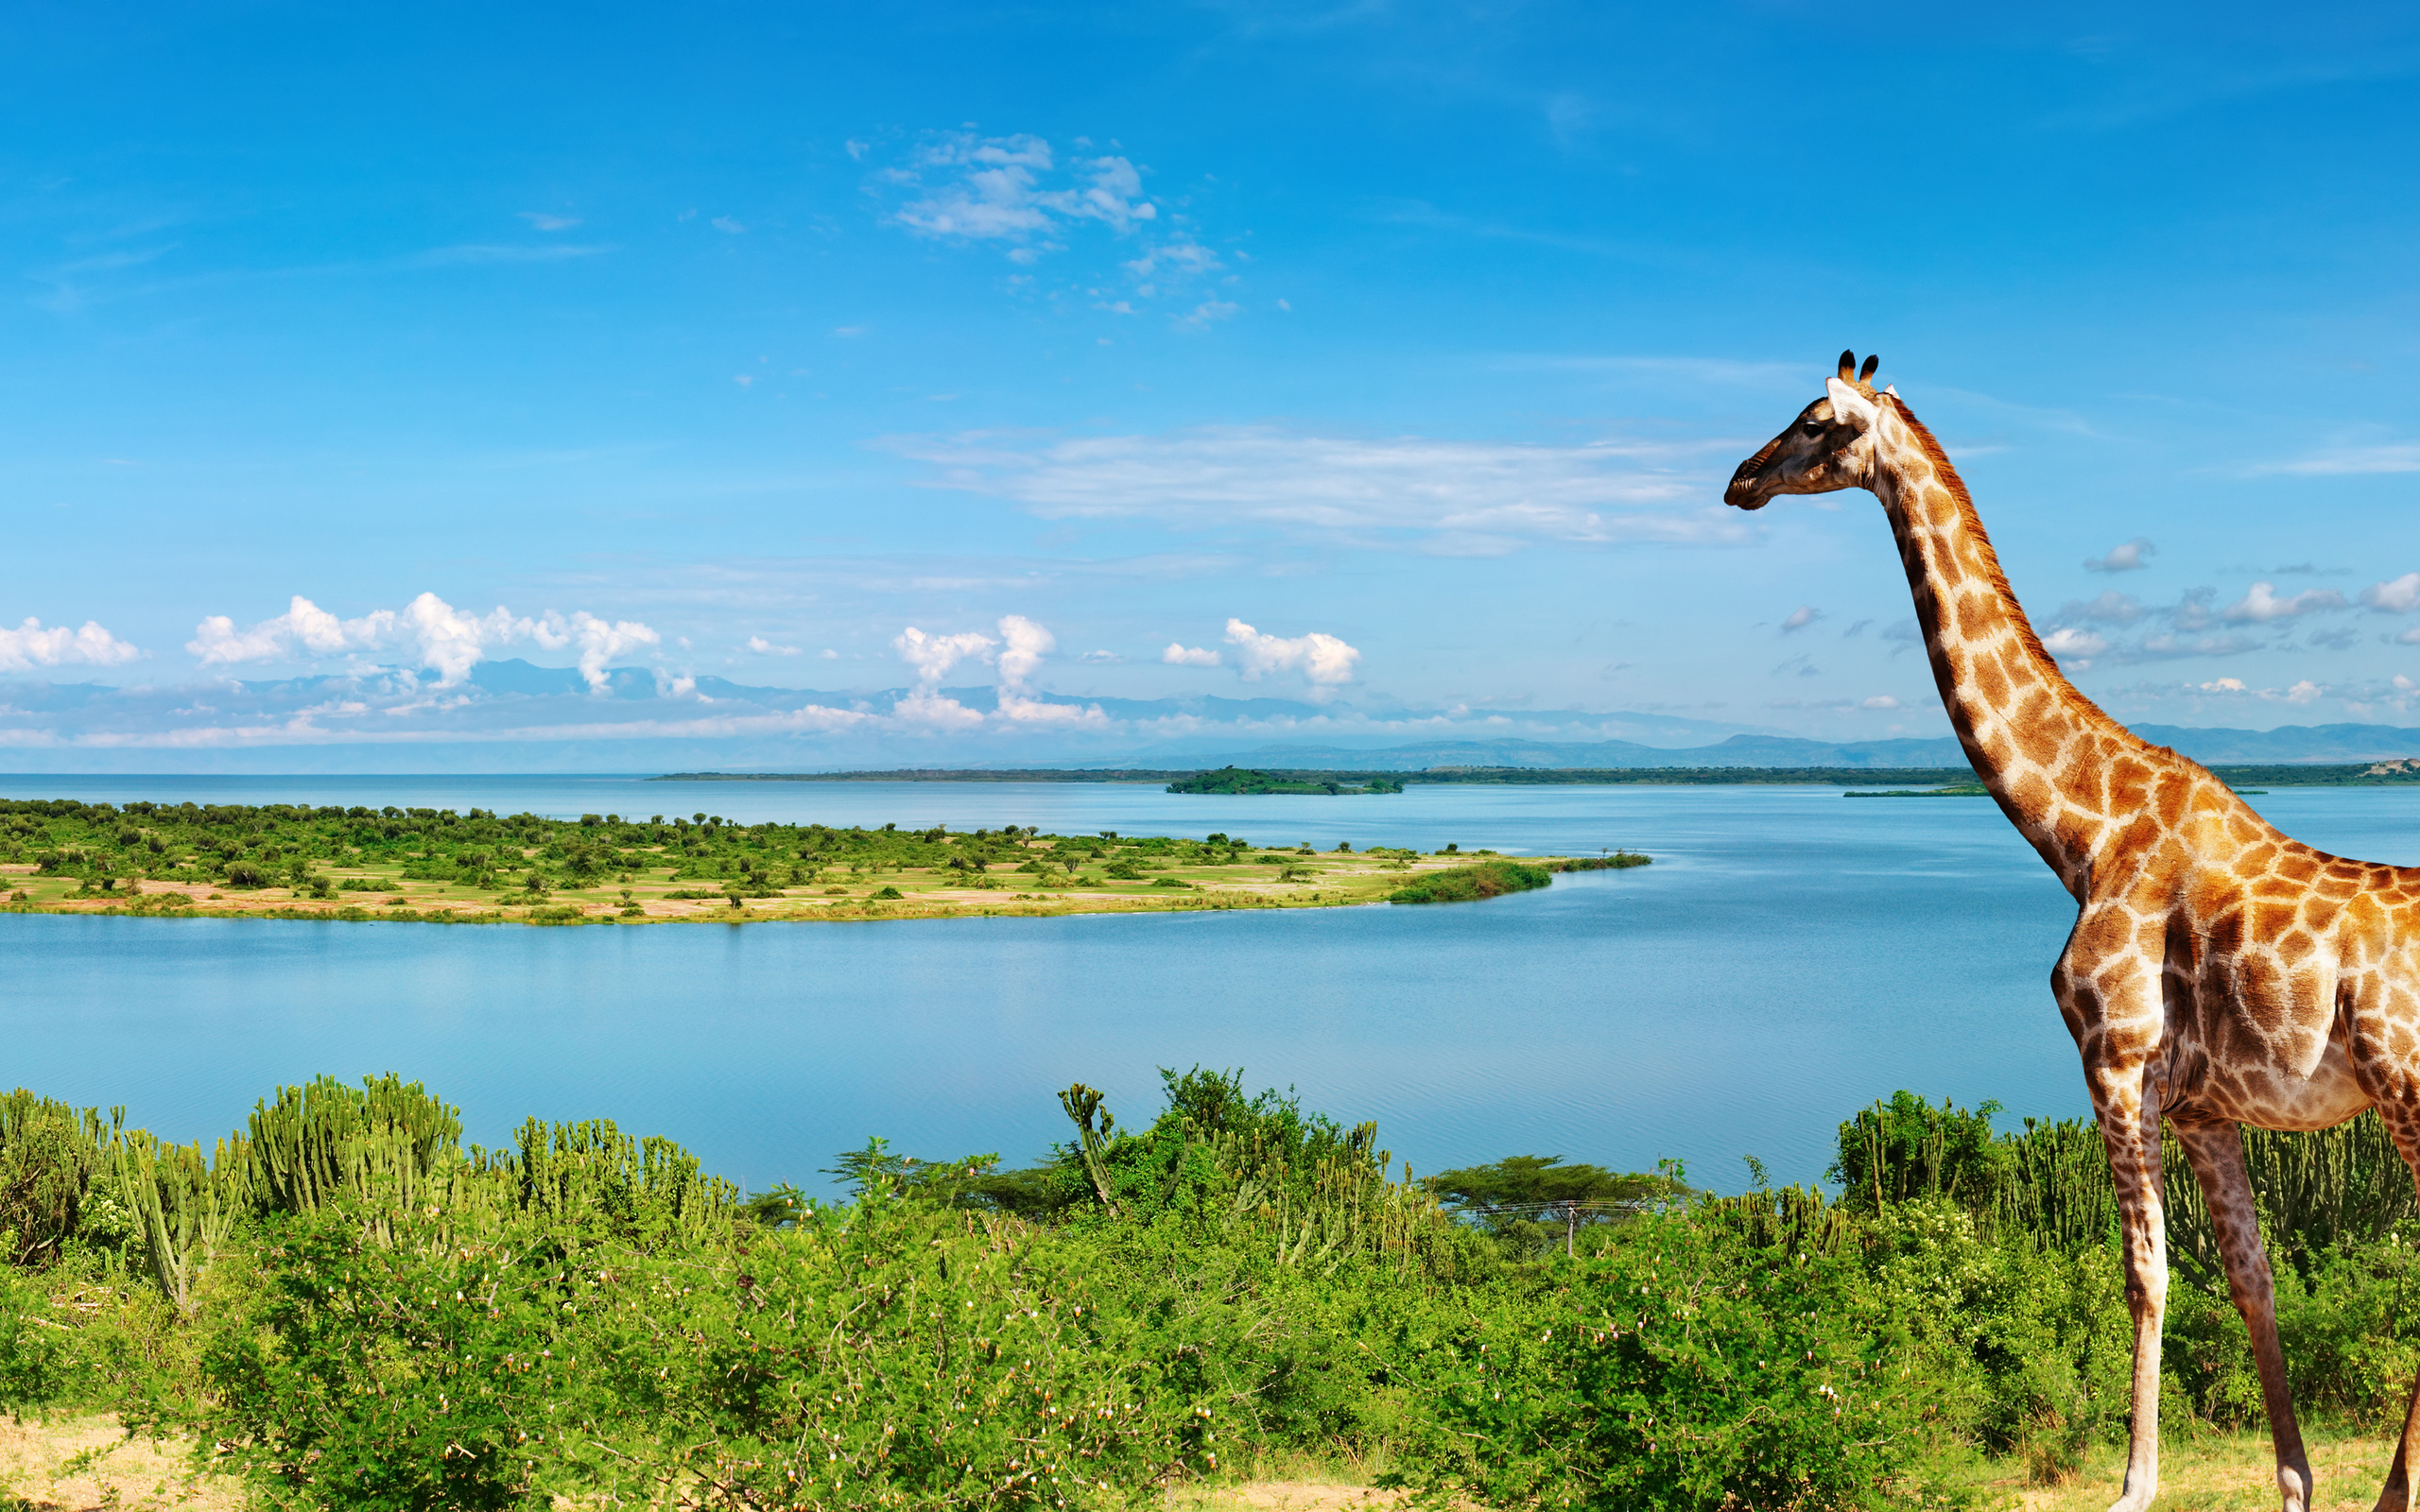 Giraffe at Nile river 4K Ultra HD wallpaper 4k WallpaperNet 2560x1600